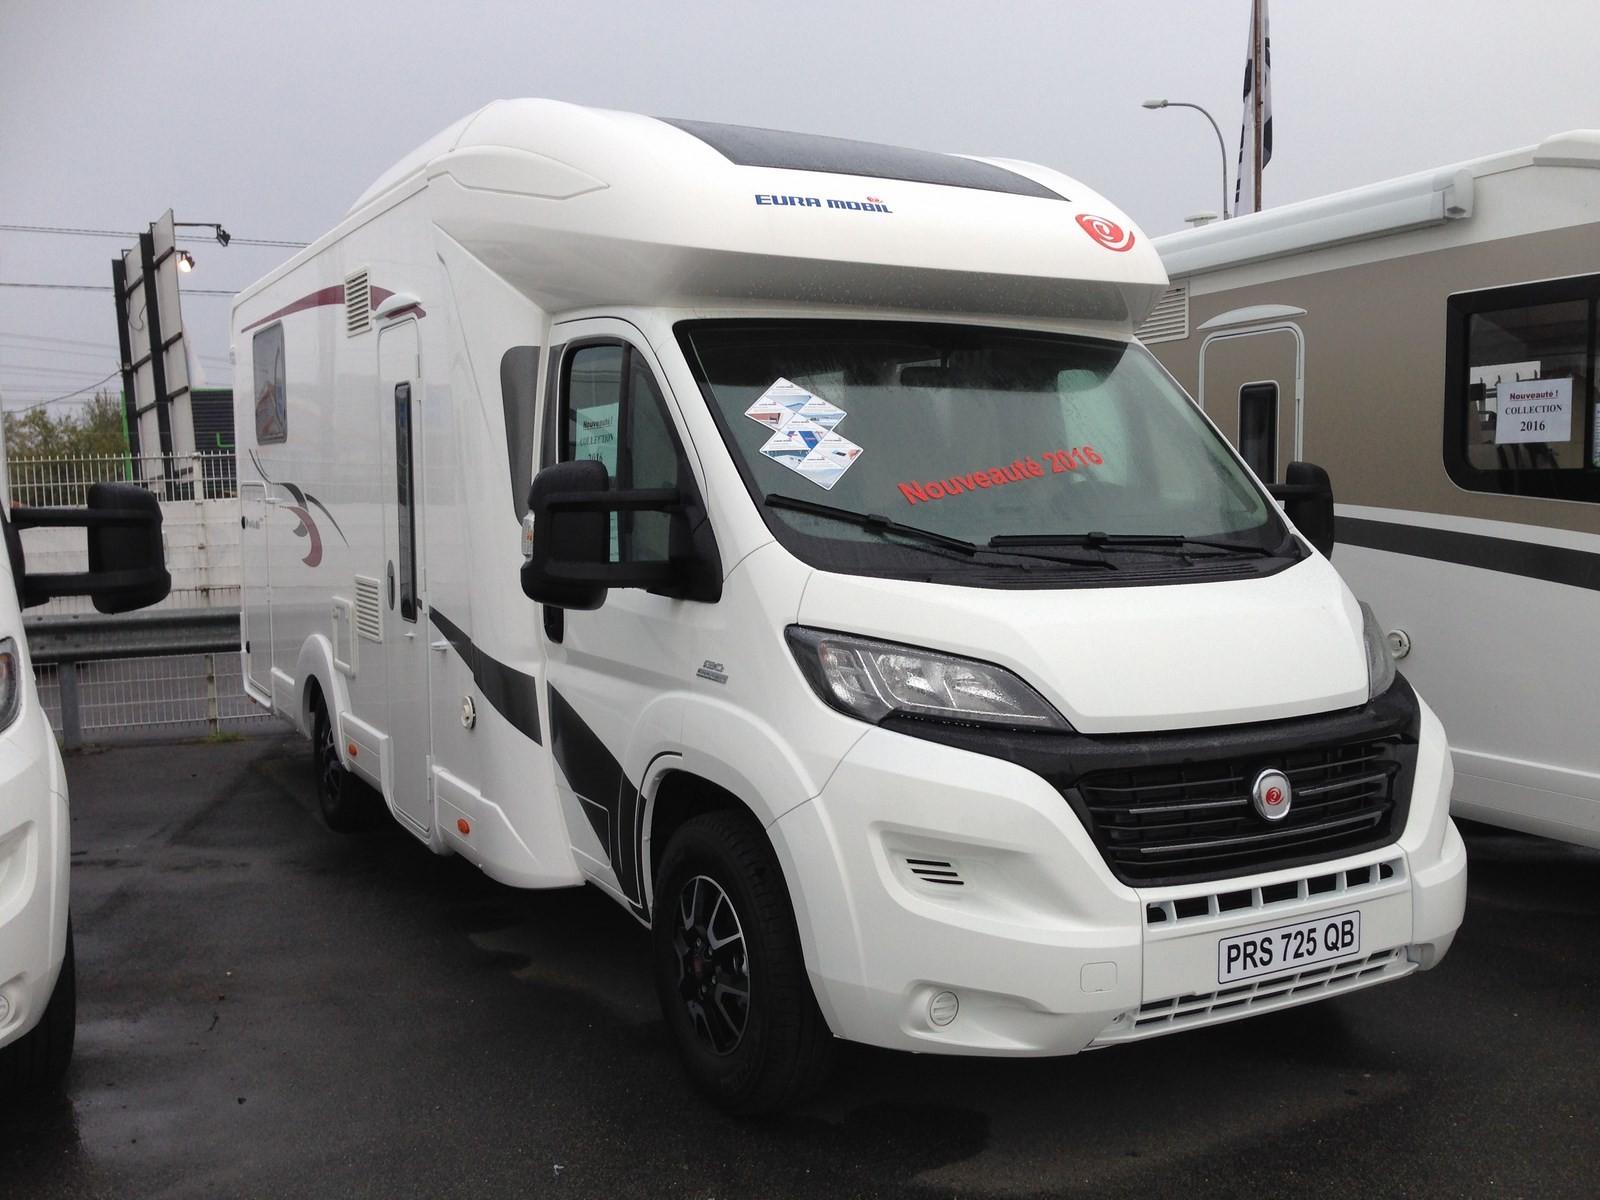 eura mobil profila rs 725 qb excellence neuf porteur fiat 2 3 jtd 130 cv camping car vendre. Black Bedroom Furniture Sets. Home Design Ideas